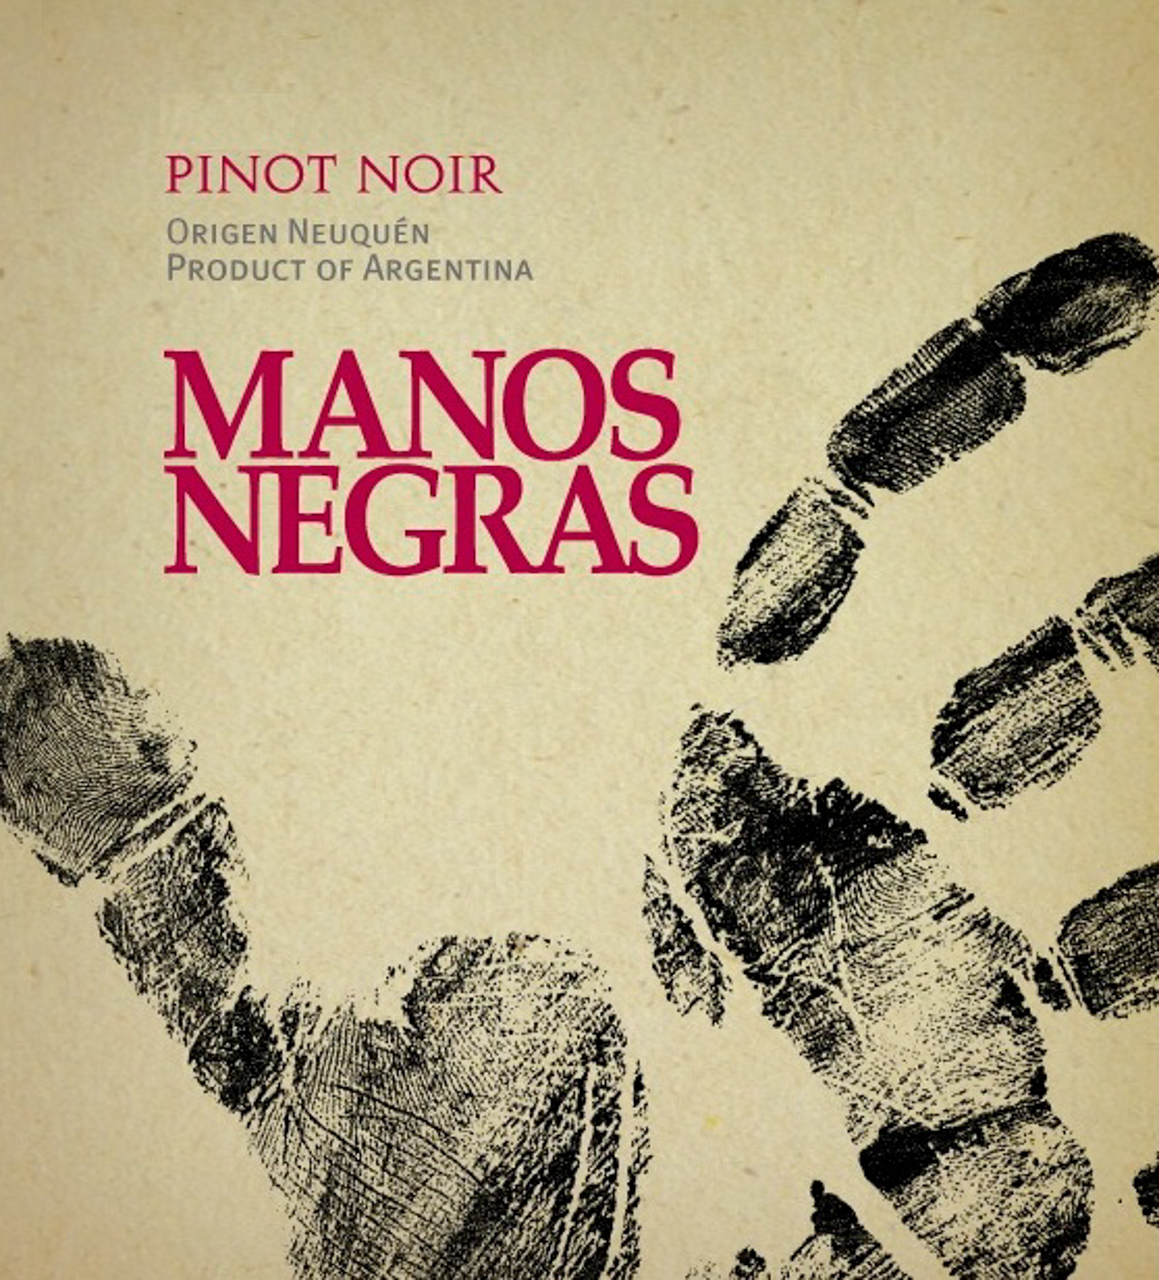 ManosNegras_PinotNoir.jpg